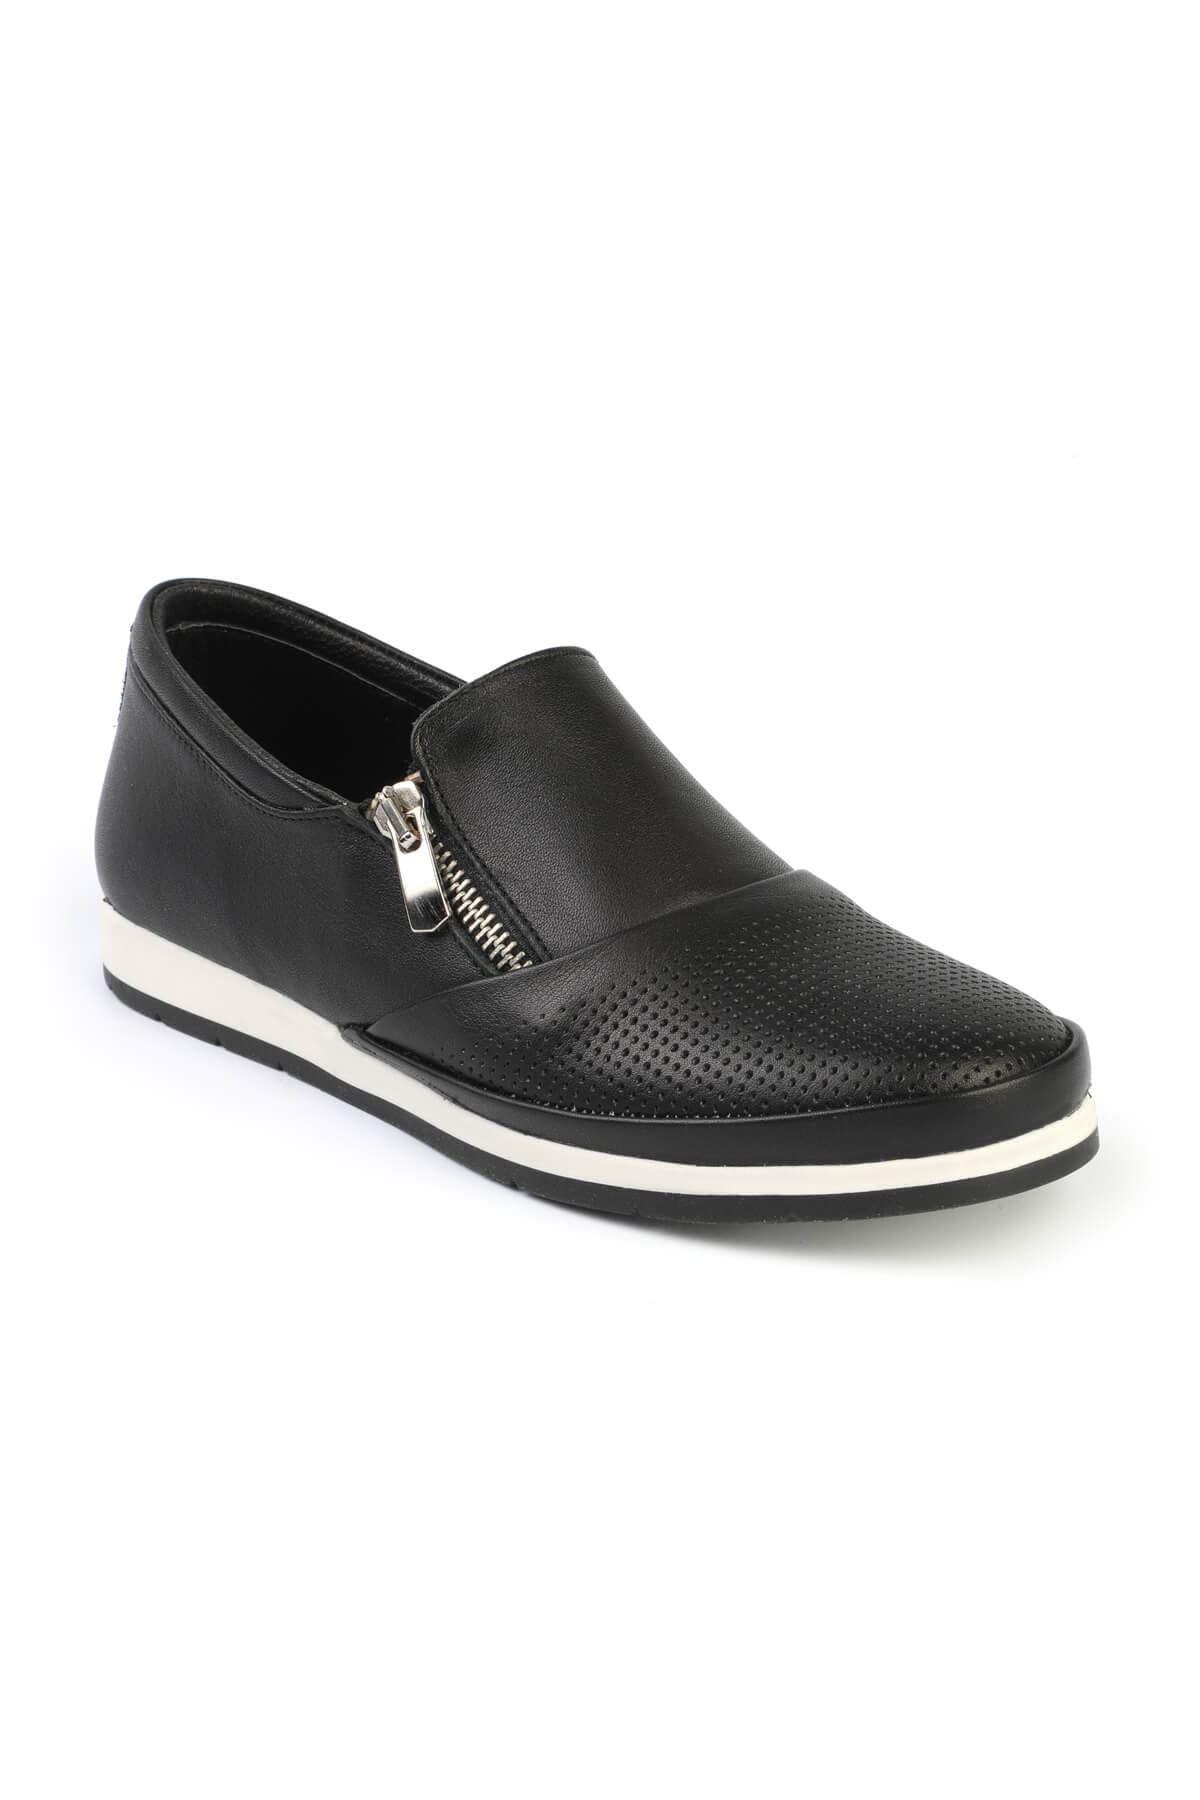 Libero FMS202 Black Casual Shoes